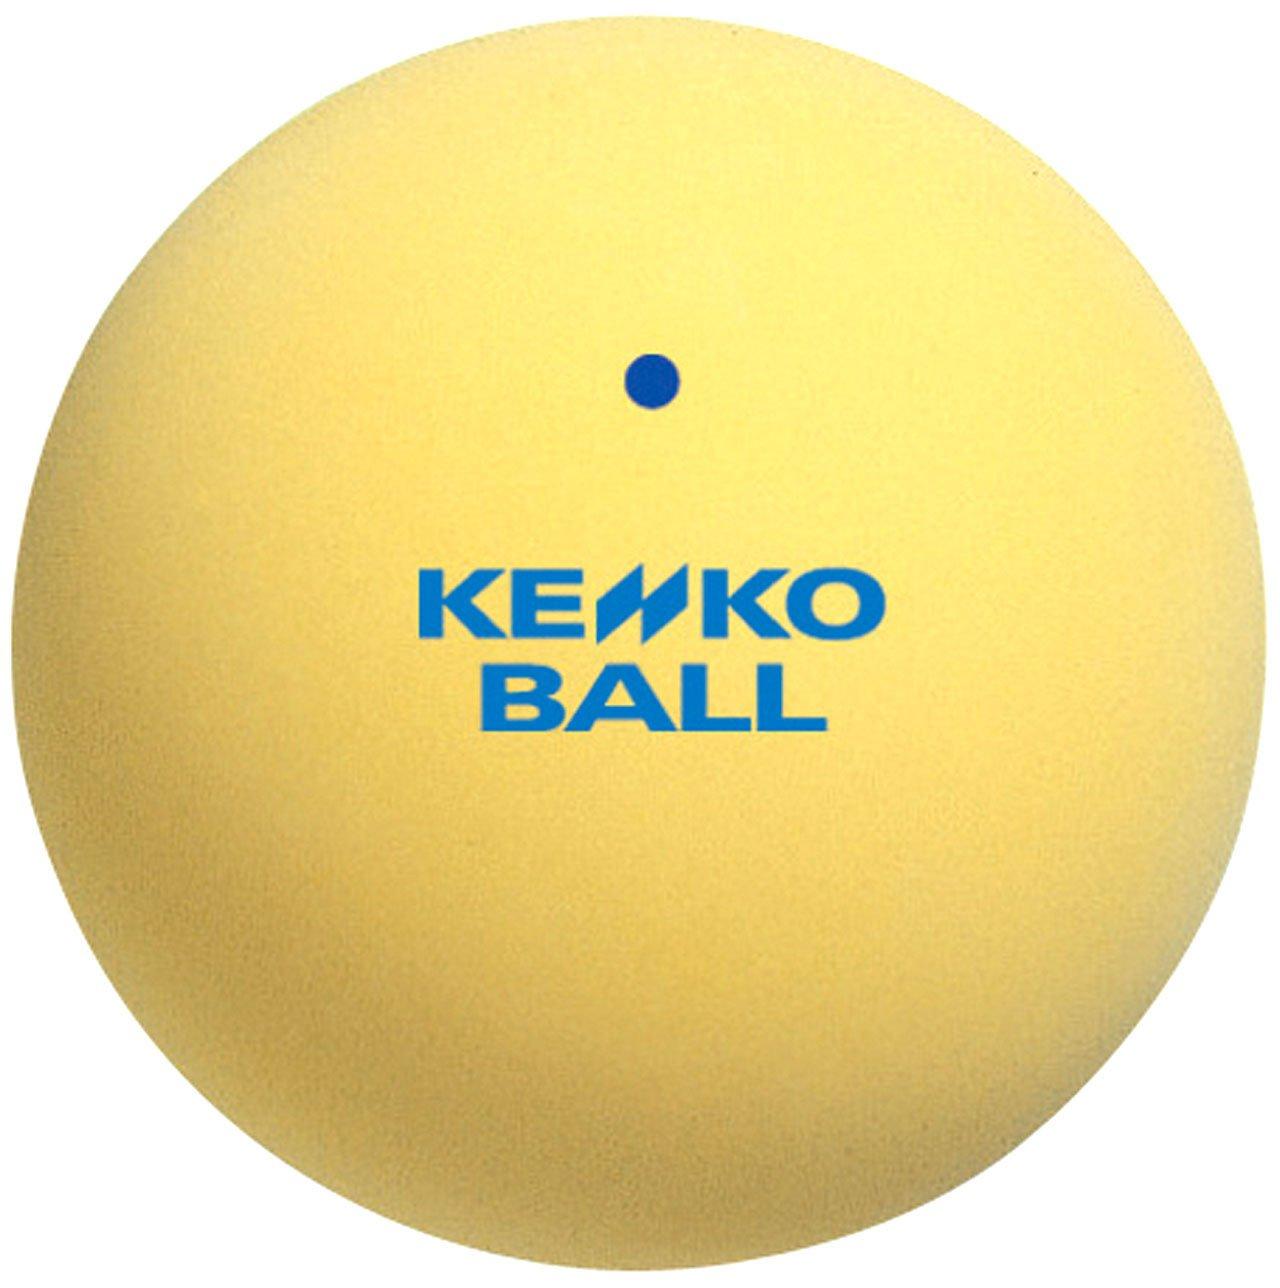 Markwort Kenko Soft Tennis Ball Starter Set (Yellow, 4-Piece) by Markwort